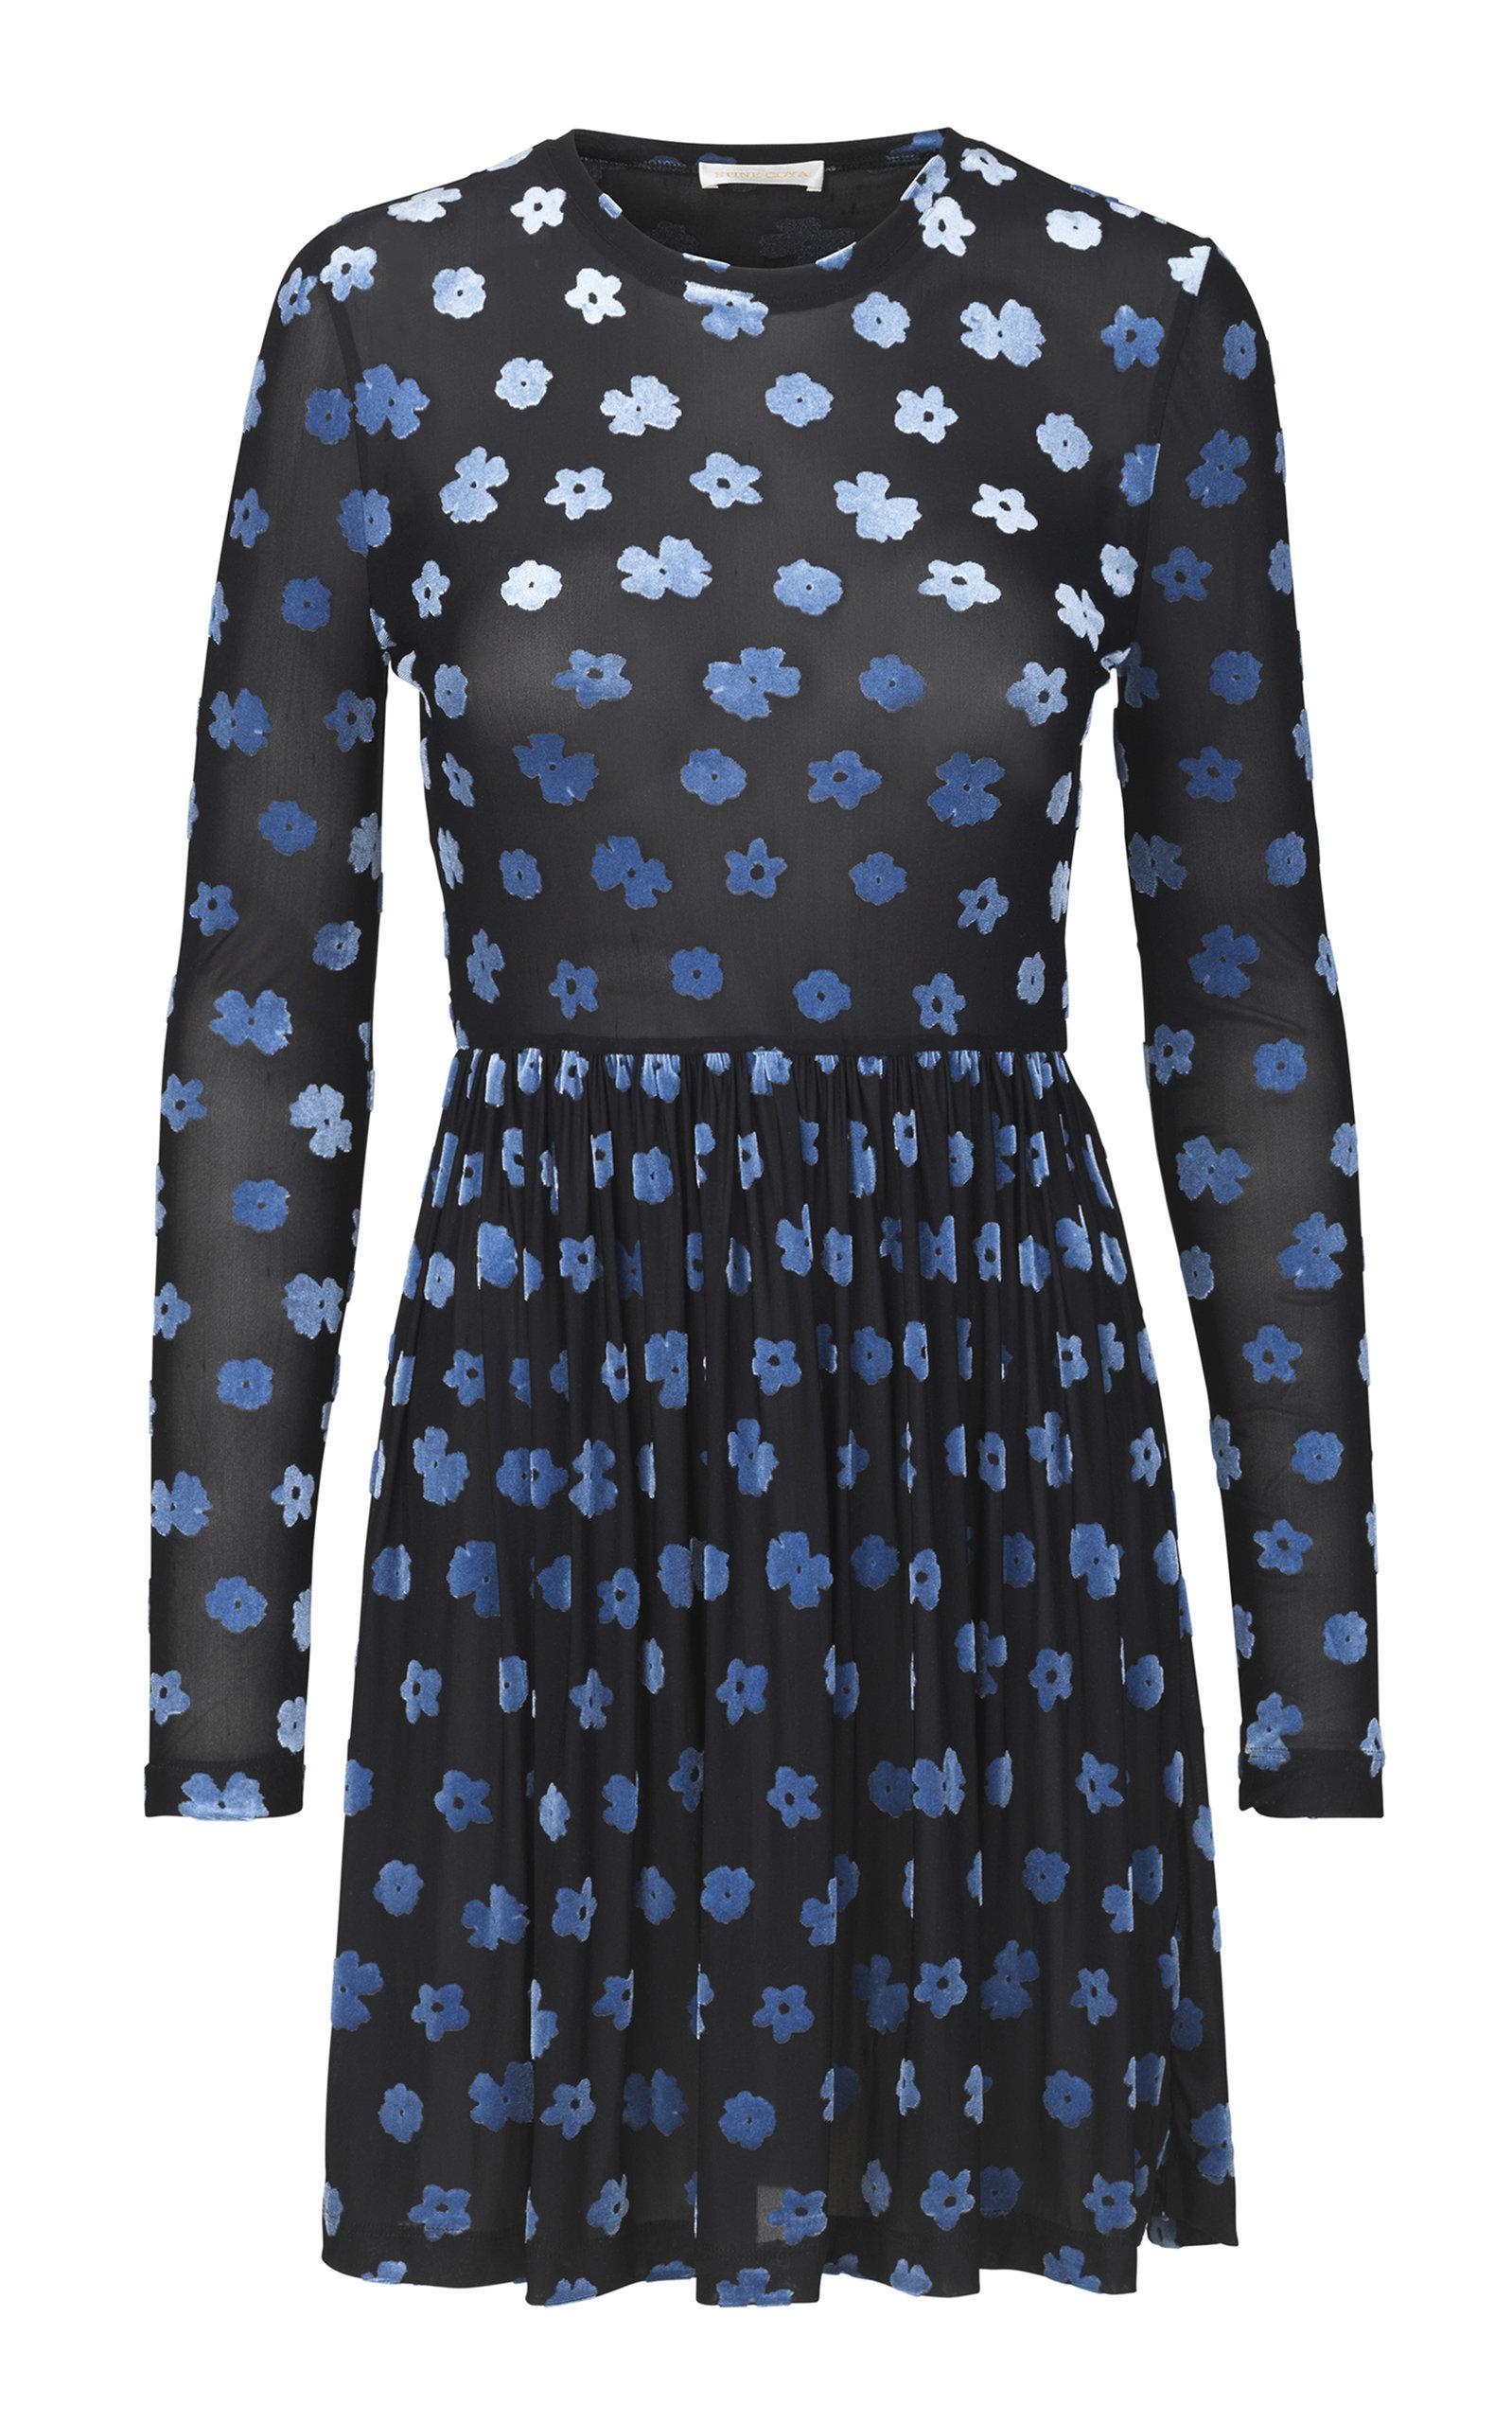 Buy Stine Goya Julianna Floral Mini Long Sleeve Dress online, shop Stine Goya at the best price